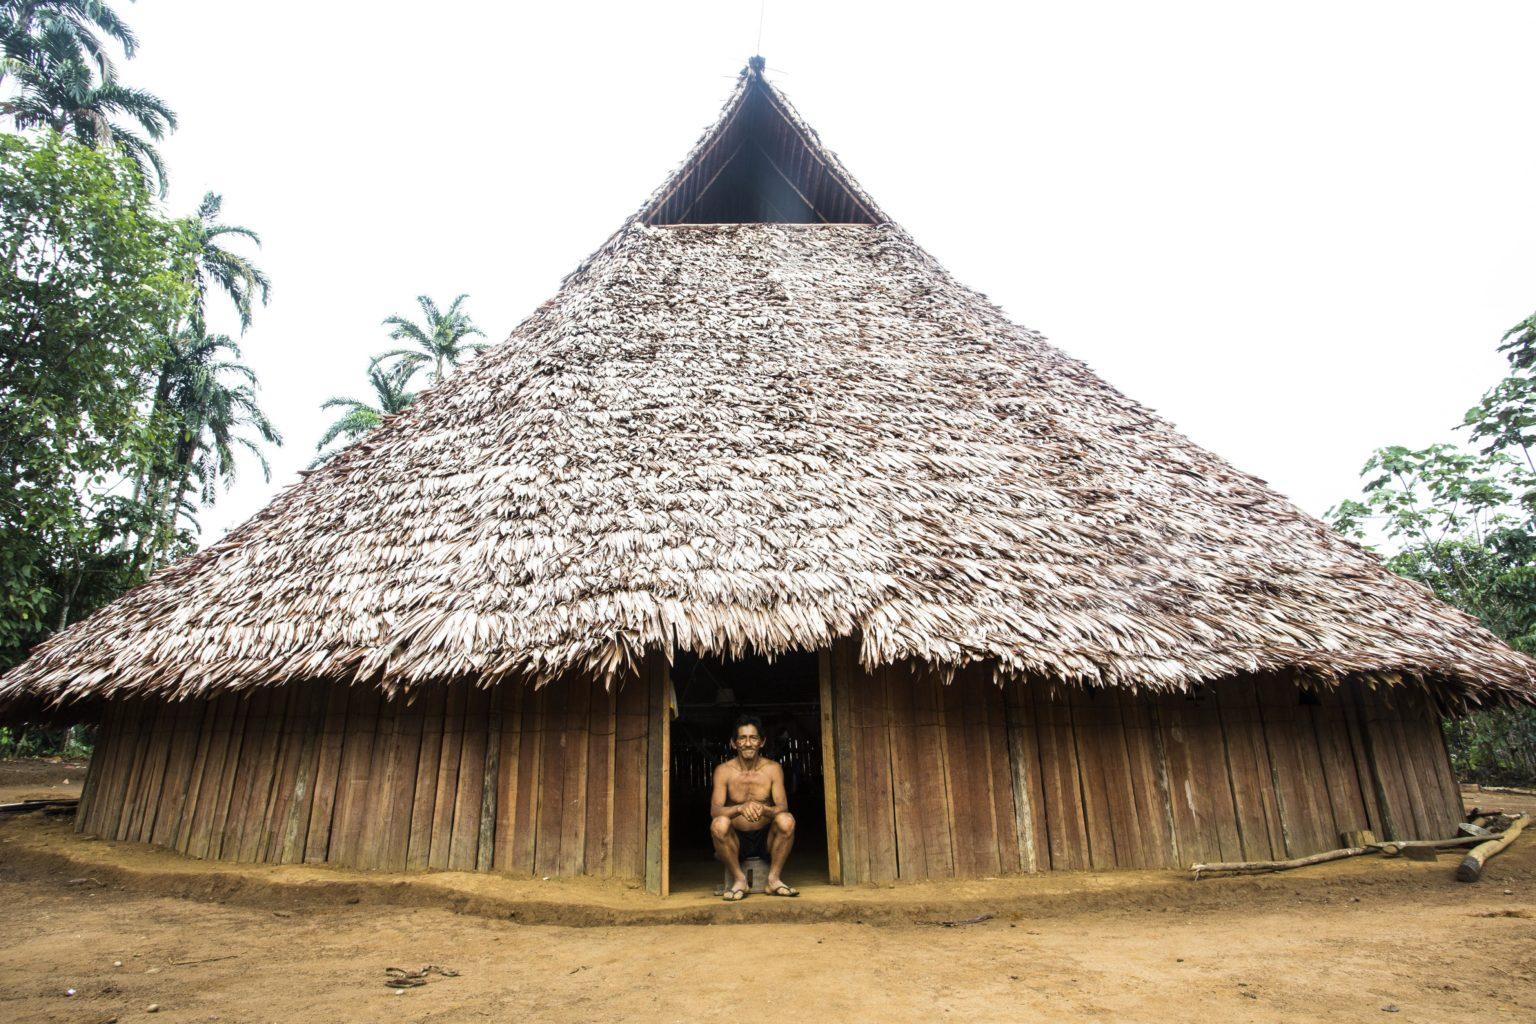 Indigenous Maloka in the Apaporis. Image courtesy of Juan Gabriel Soler/GAIA Amazonas Foundation.